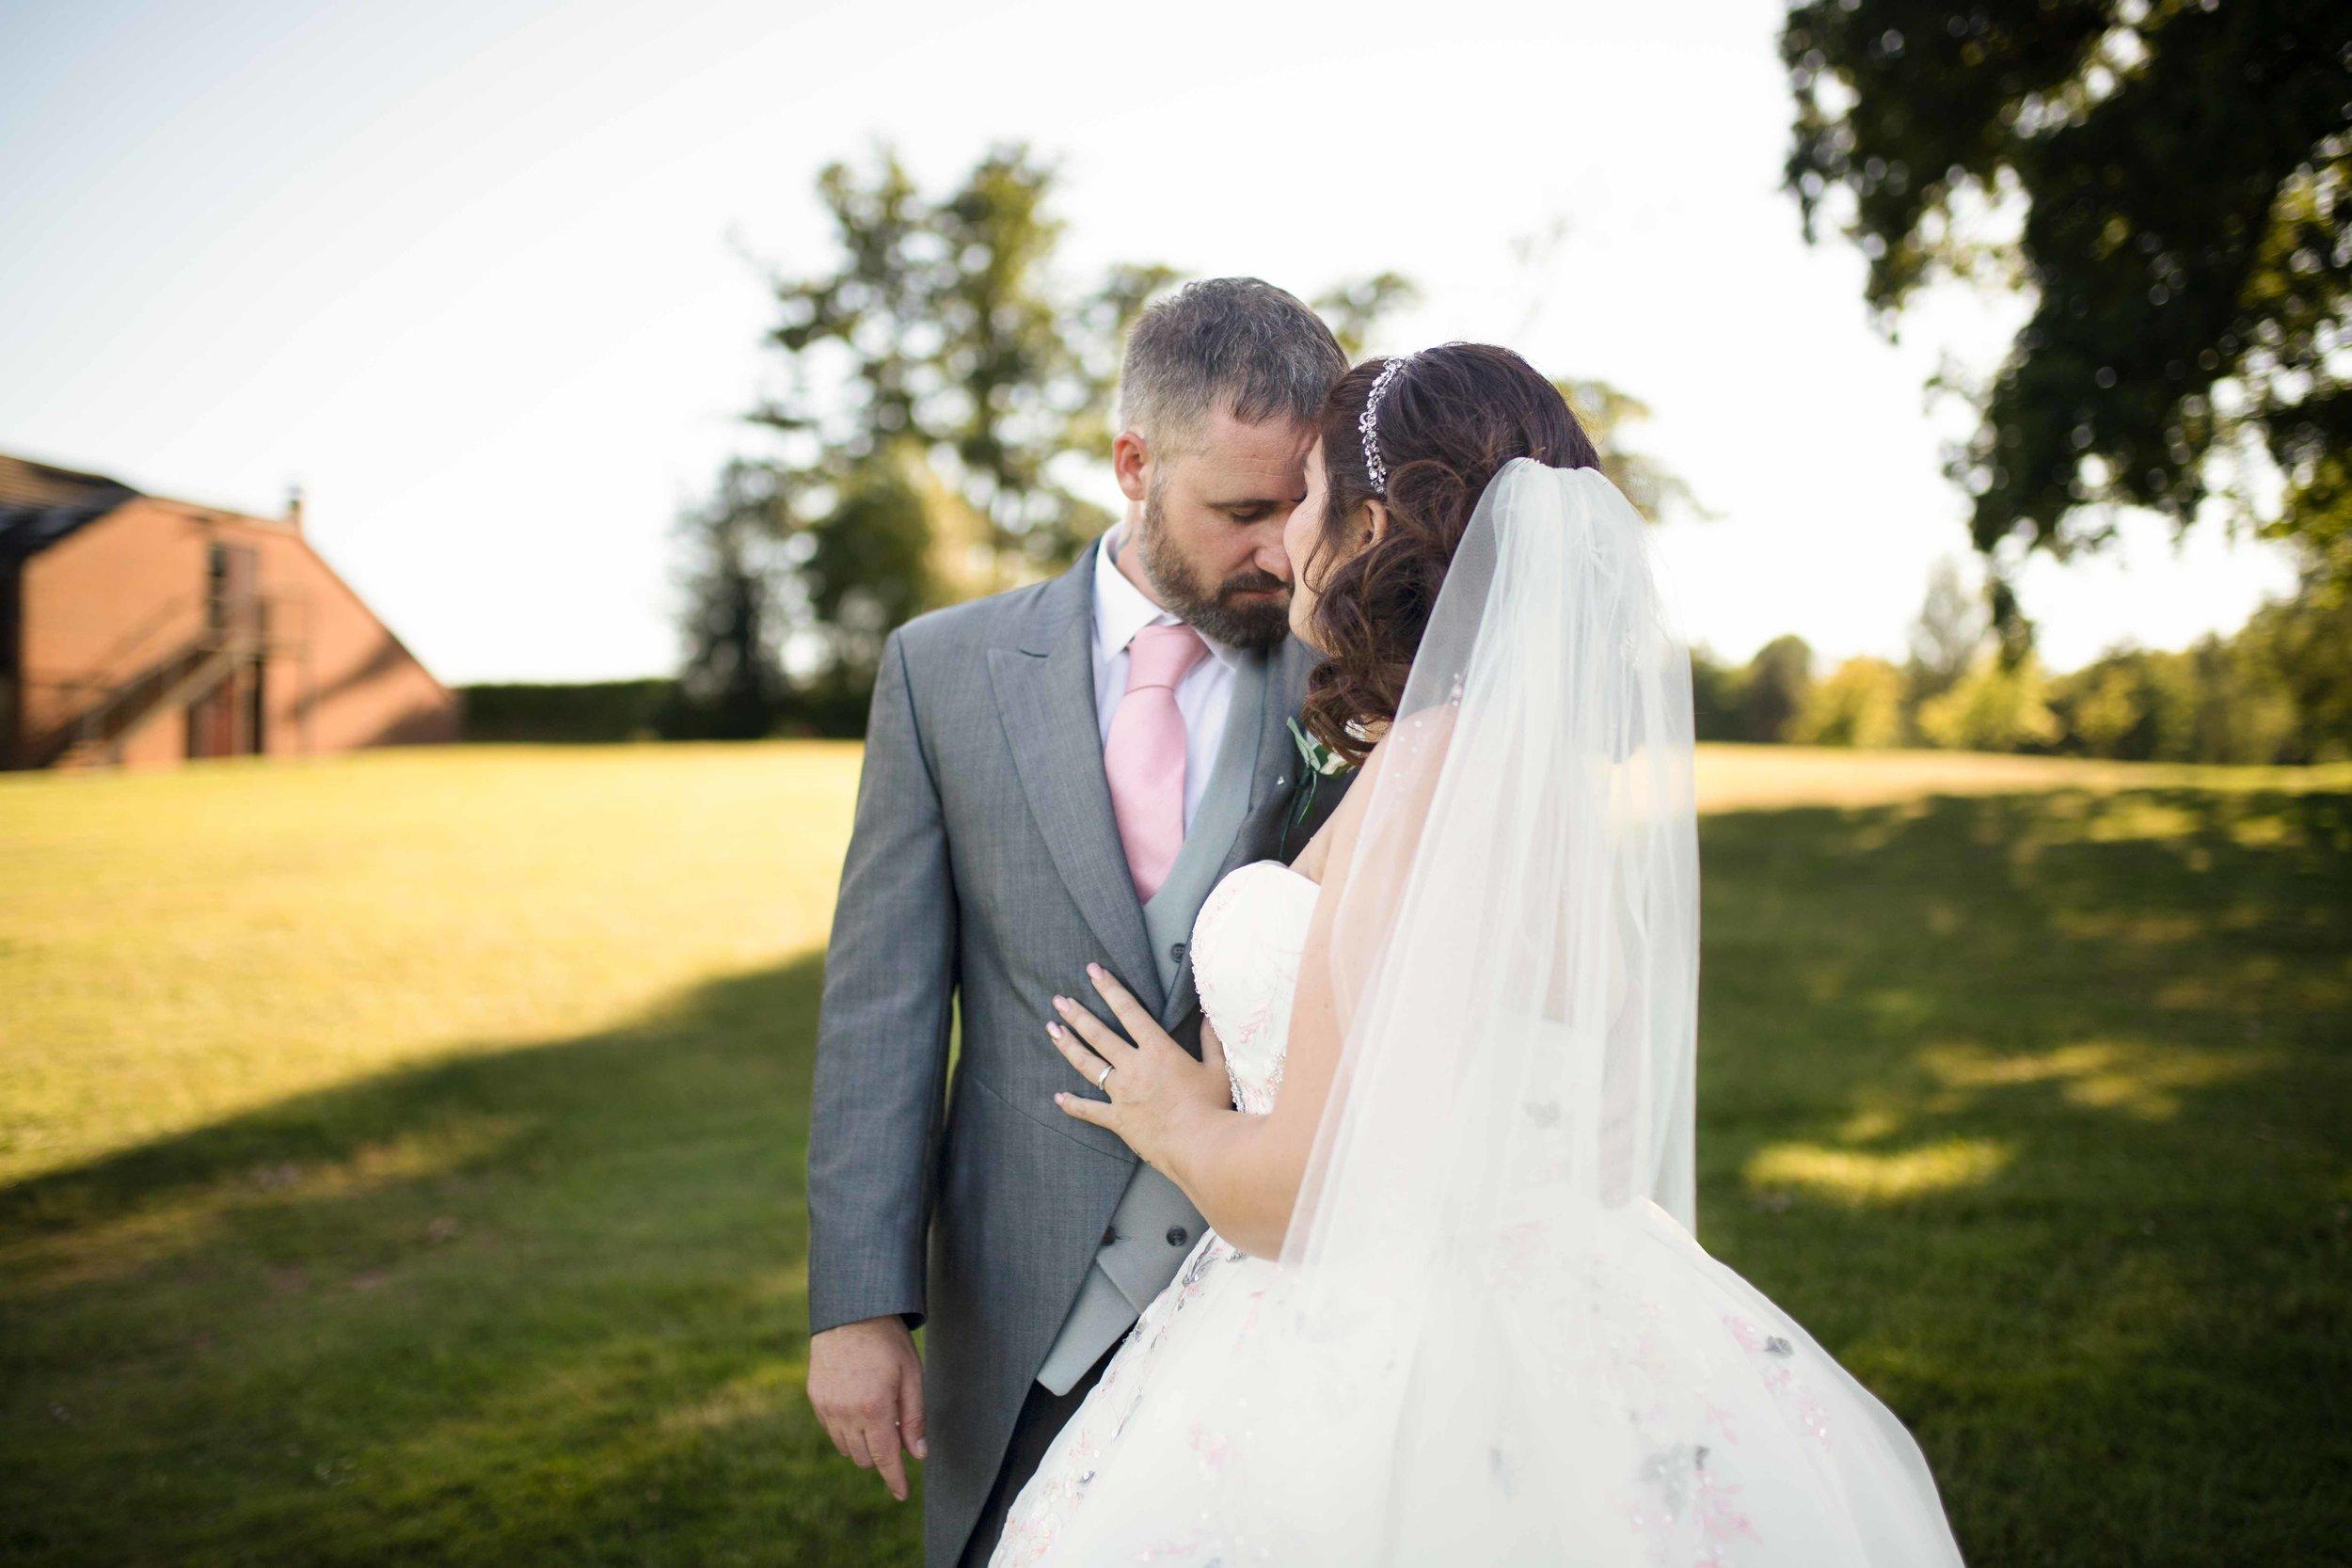 Lea-cooper-photography-wedding-photography-wolverhampton-patshull-park-hotel-wedding-pattingham-wolverhampton-west-midlands-uk-30.JPG